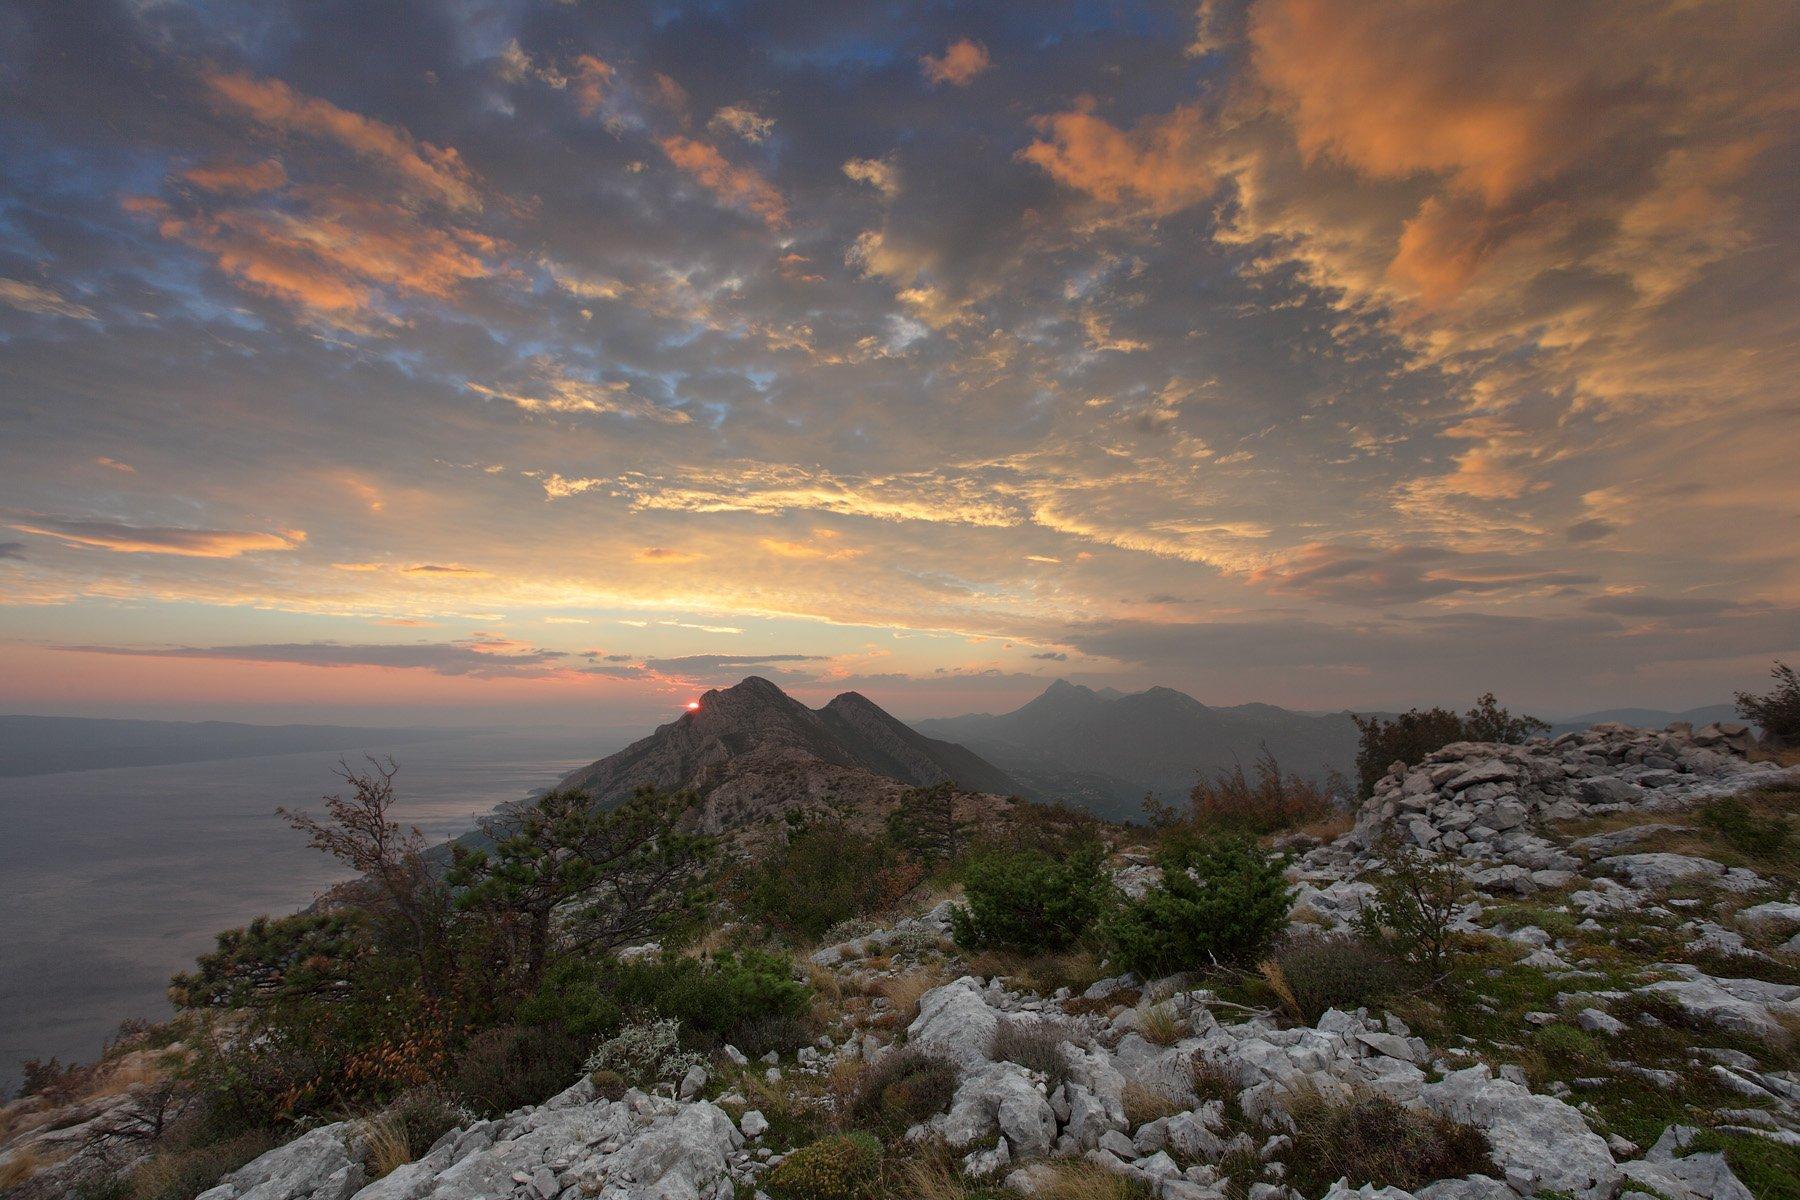 Горы Море Закат, Михаил (mgk)